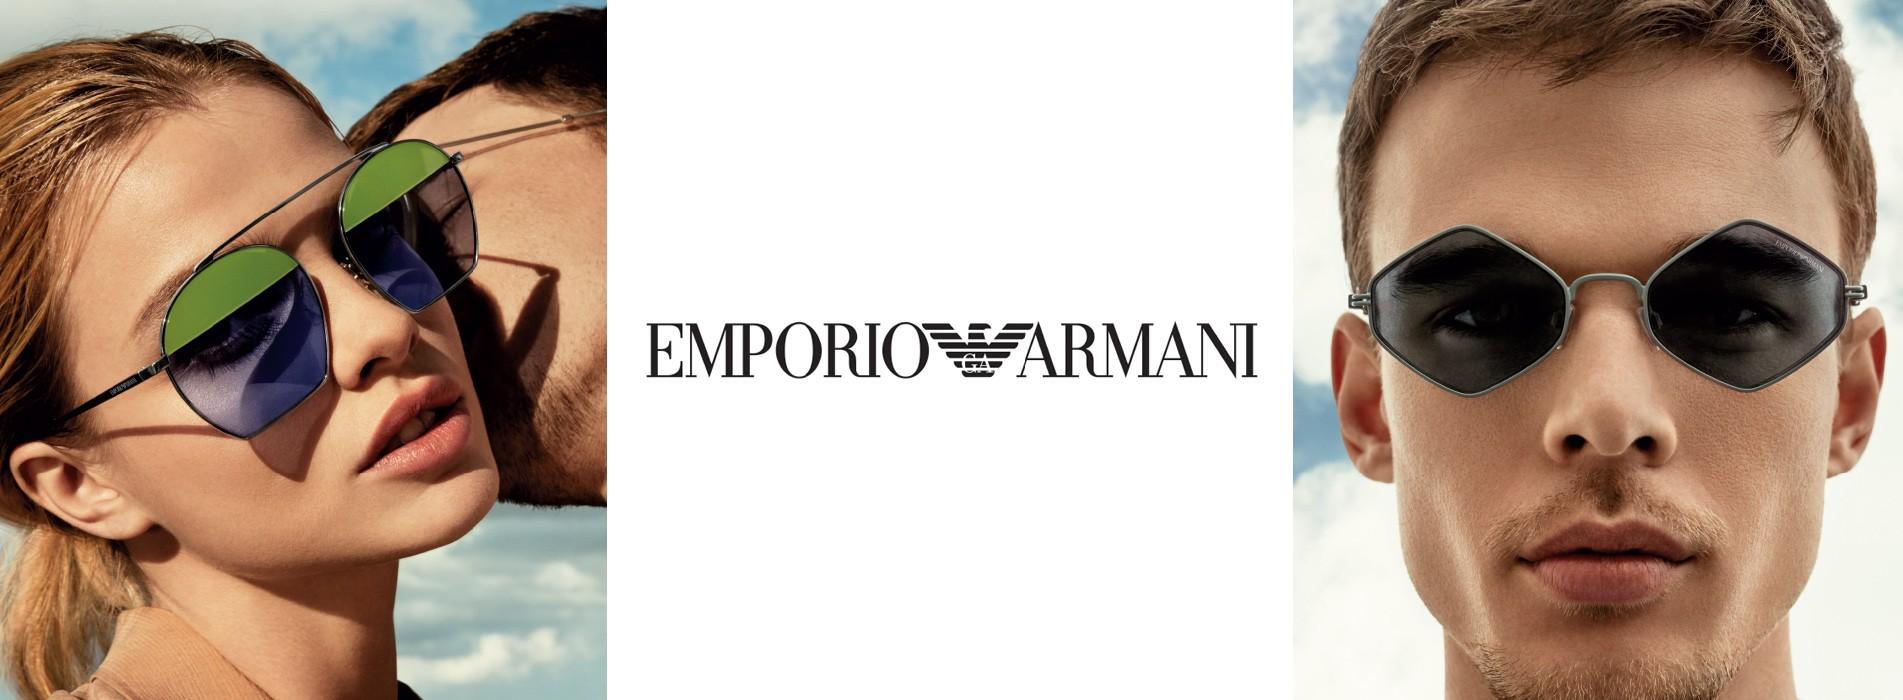 Okulary marki Emporio Armani